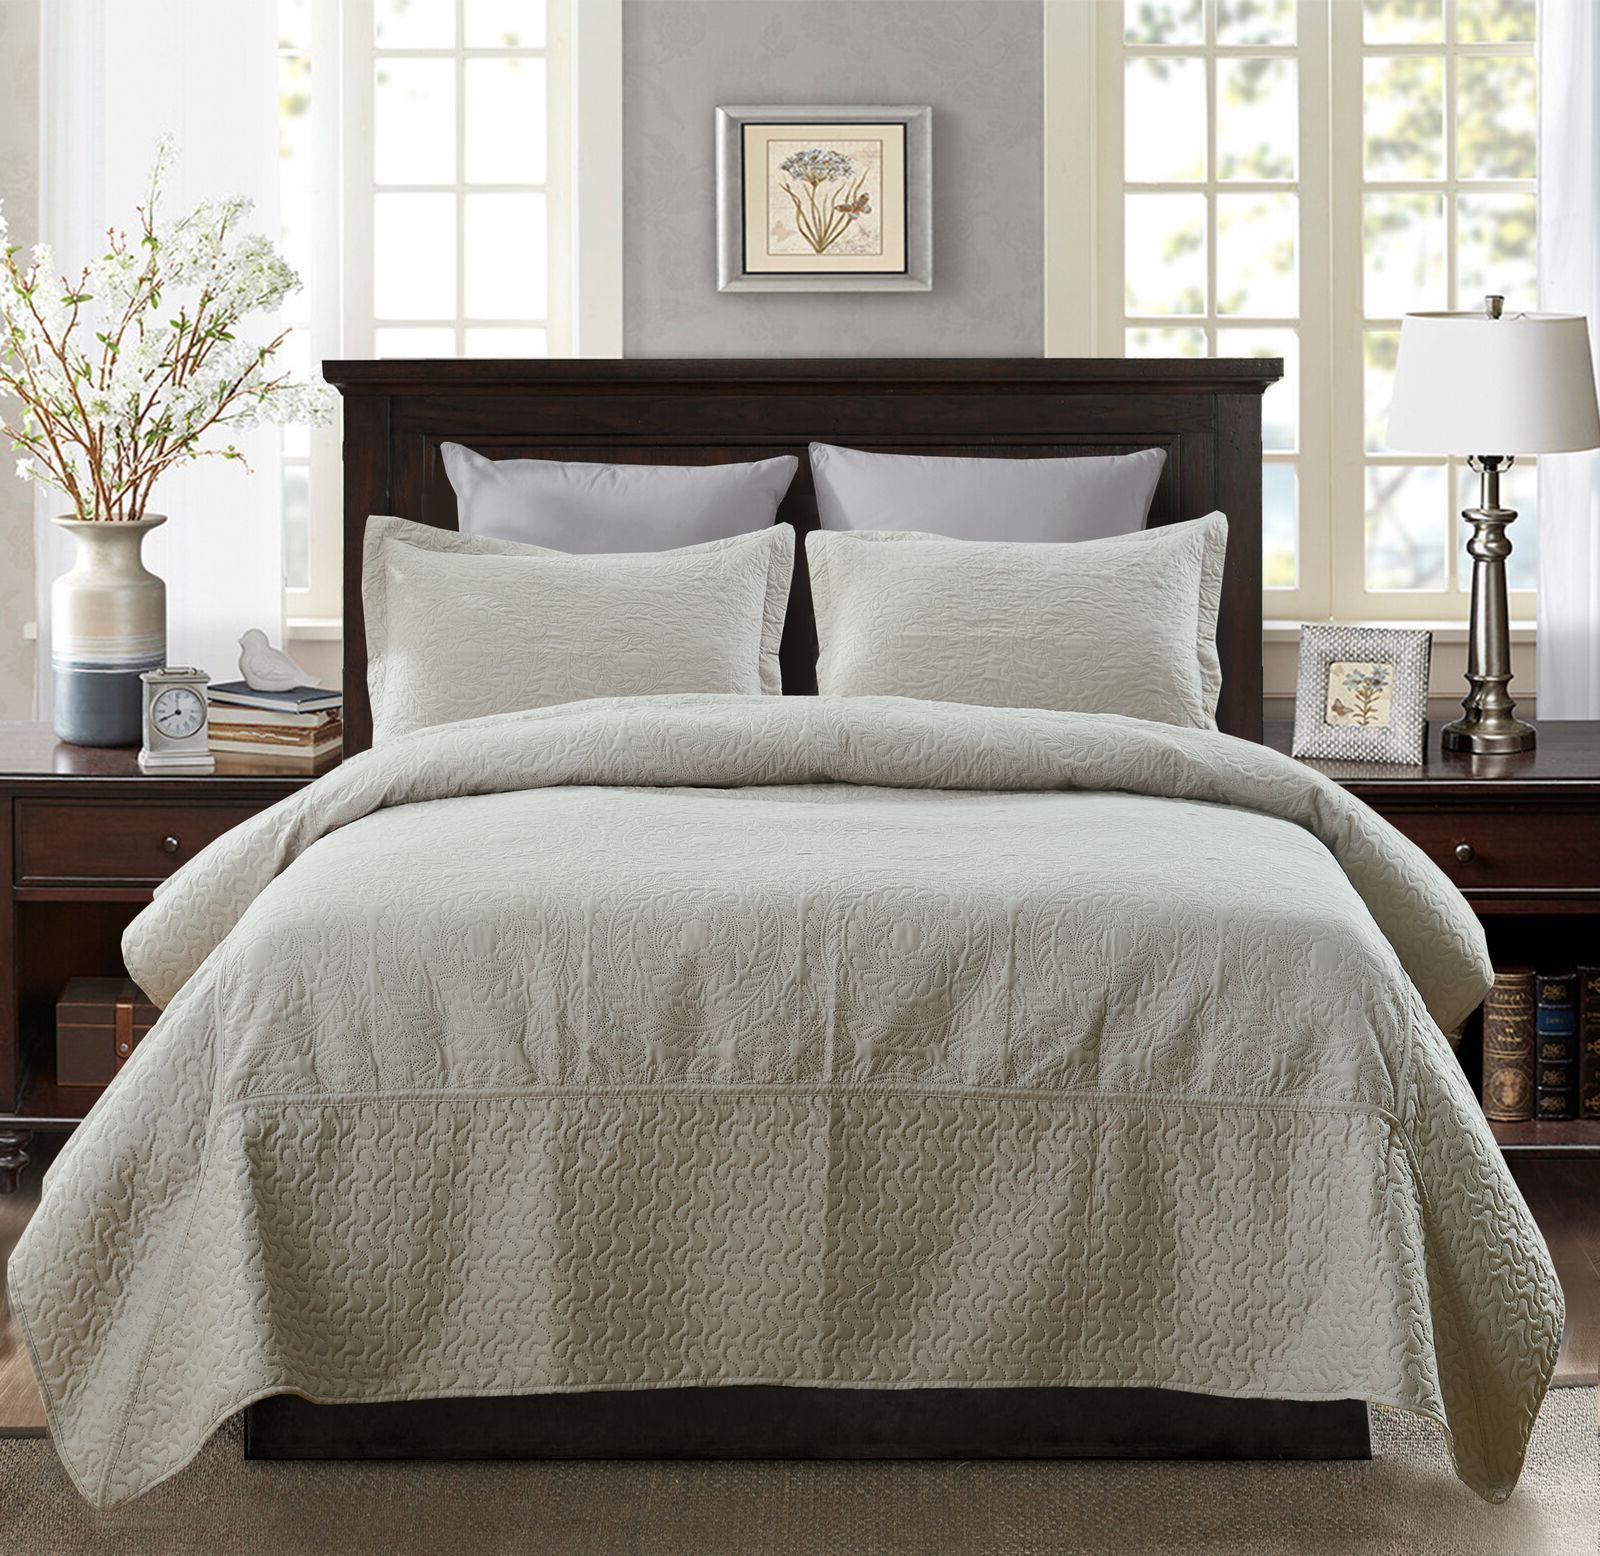 3 piece solid bedding quilt set soft